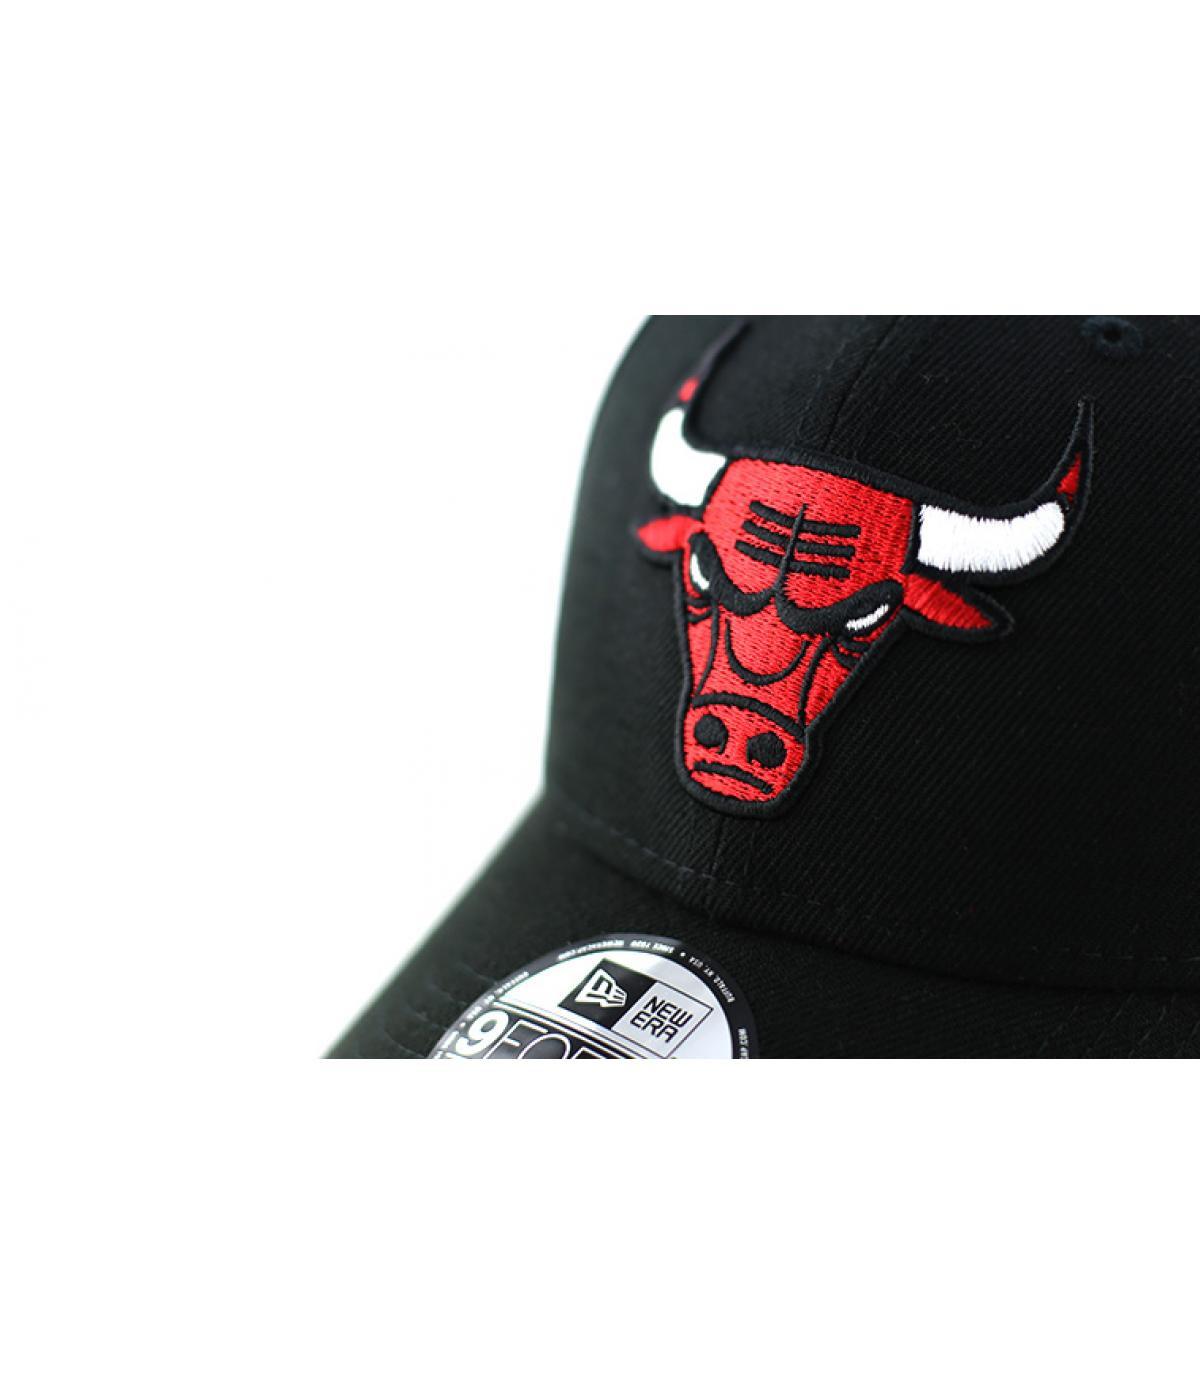 Detalles Cap Chicago Bulls The League Team imagen 3